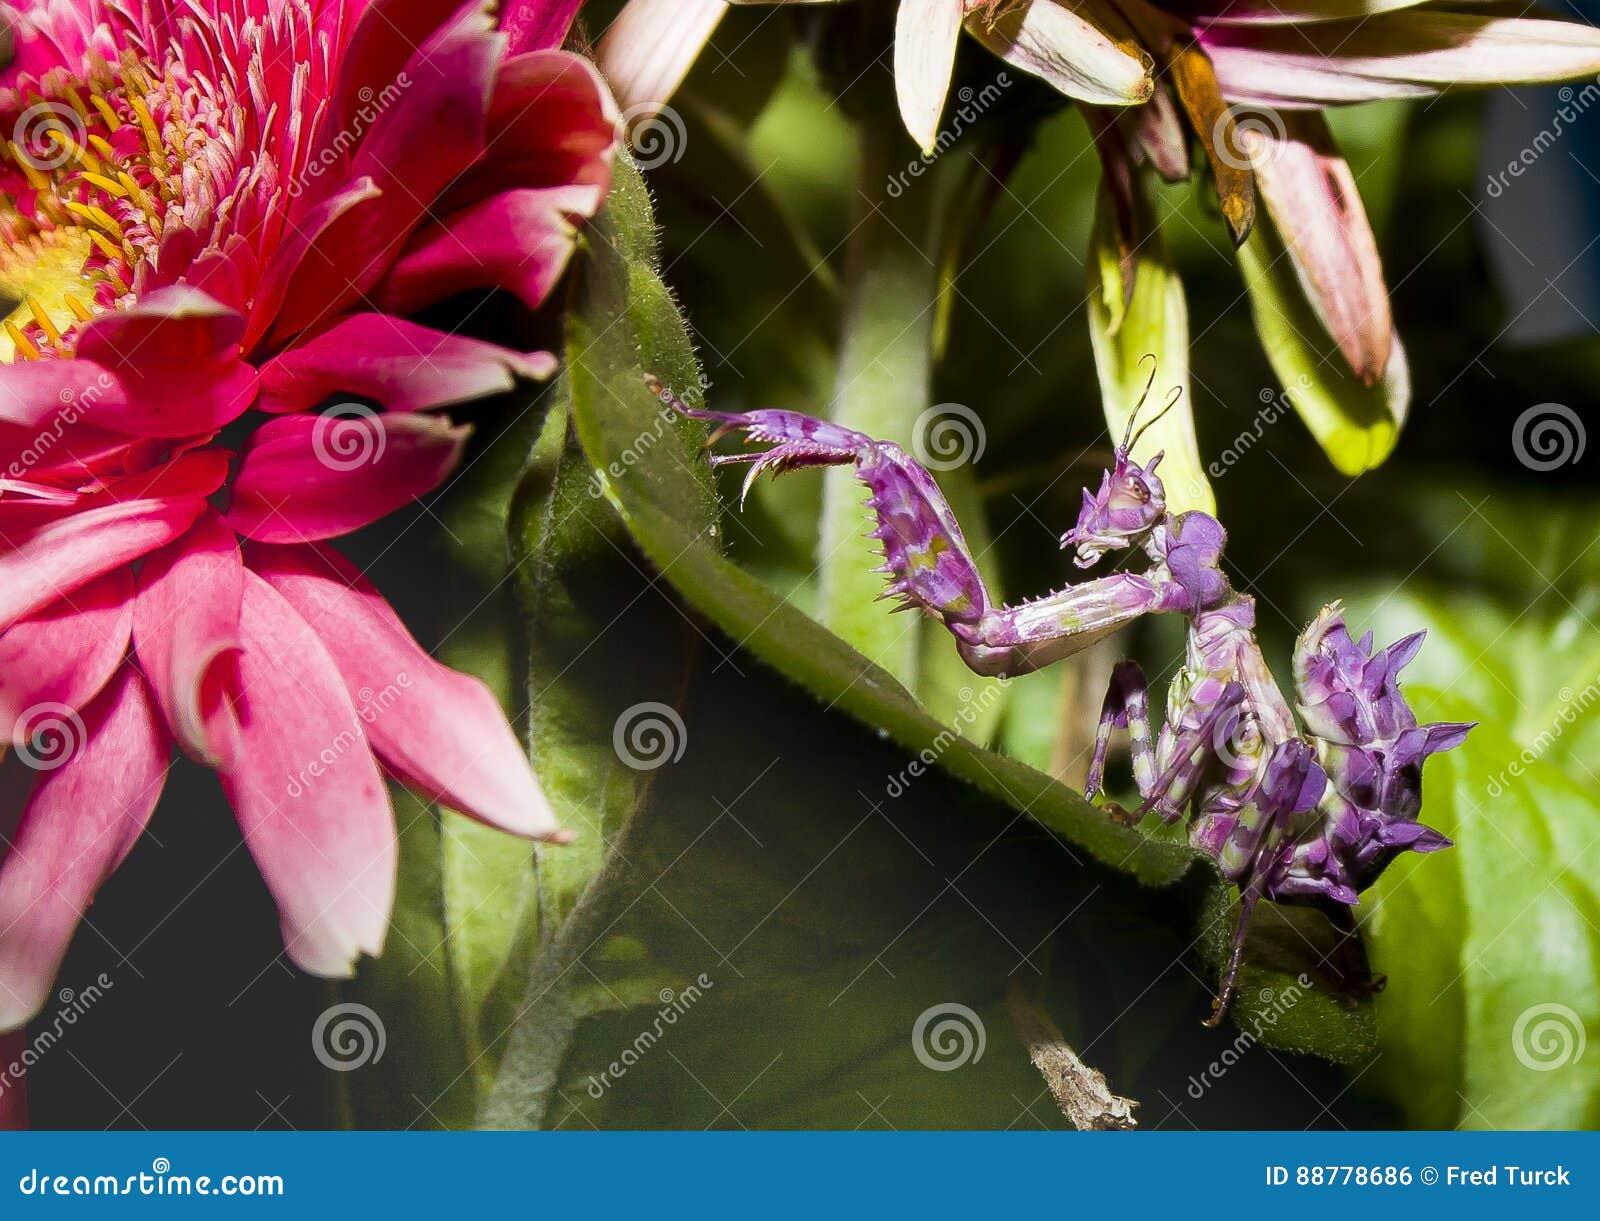 Praying Mantis Grub On Green Leaves And Pink Flower Stock Photo